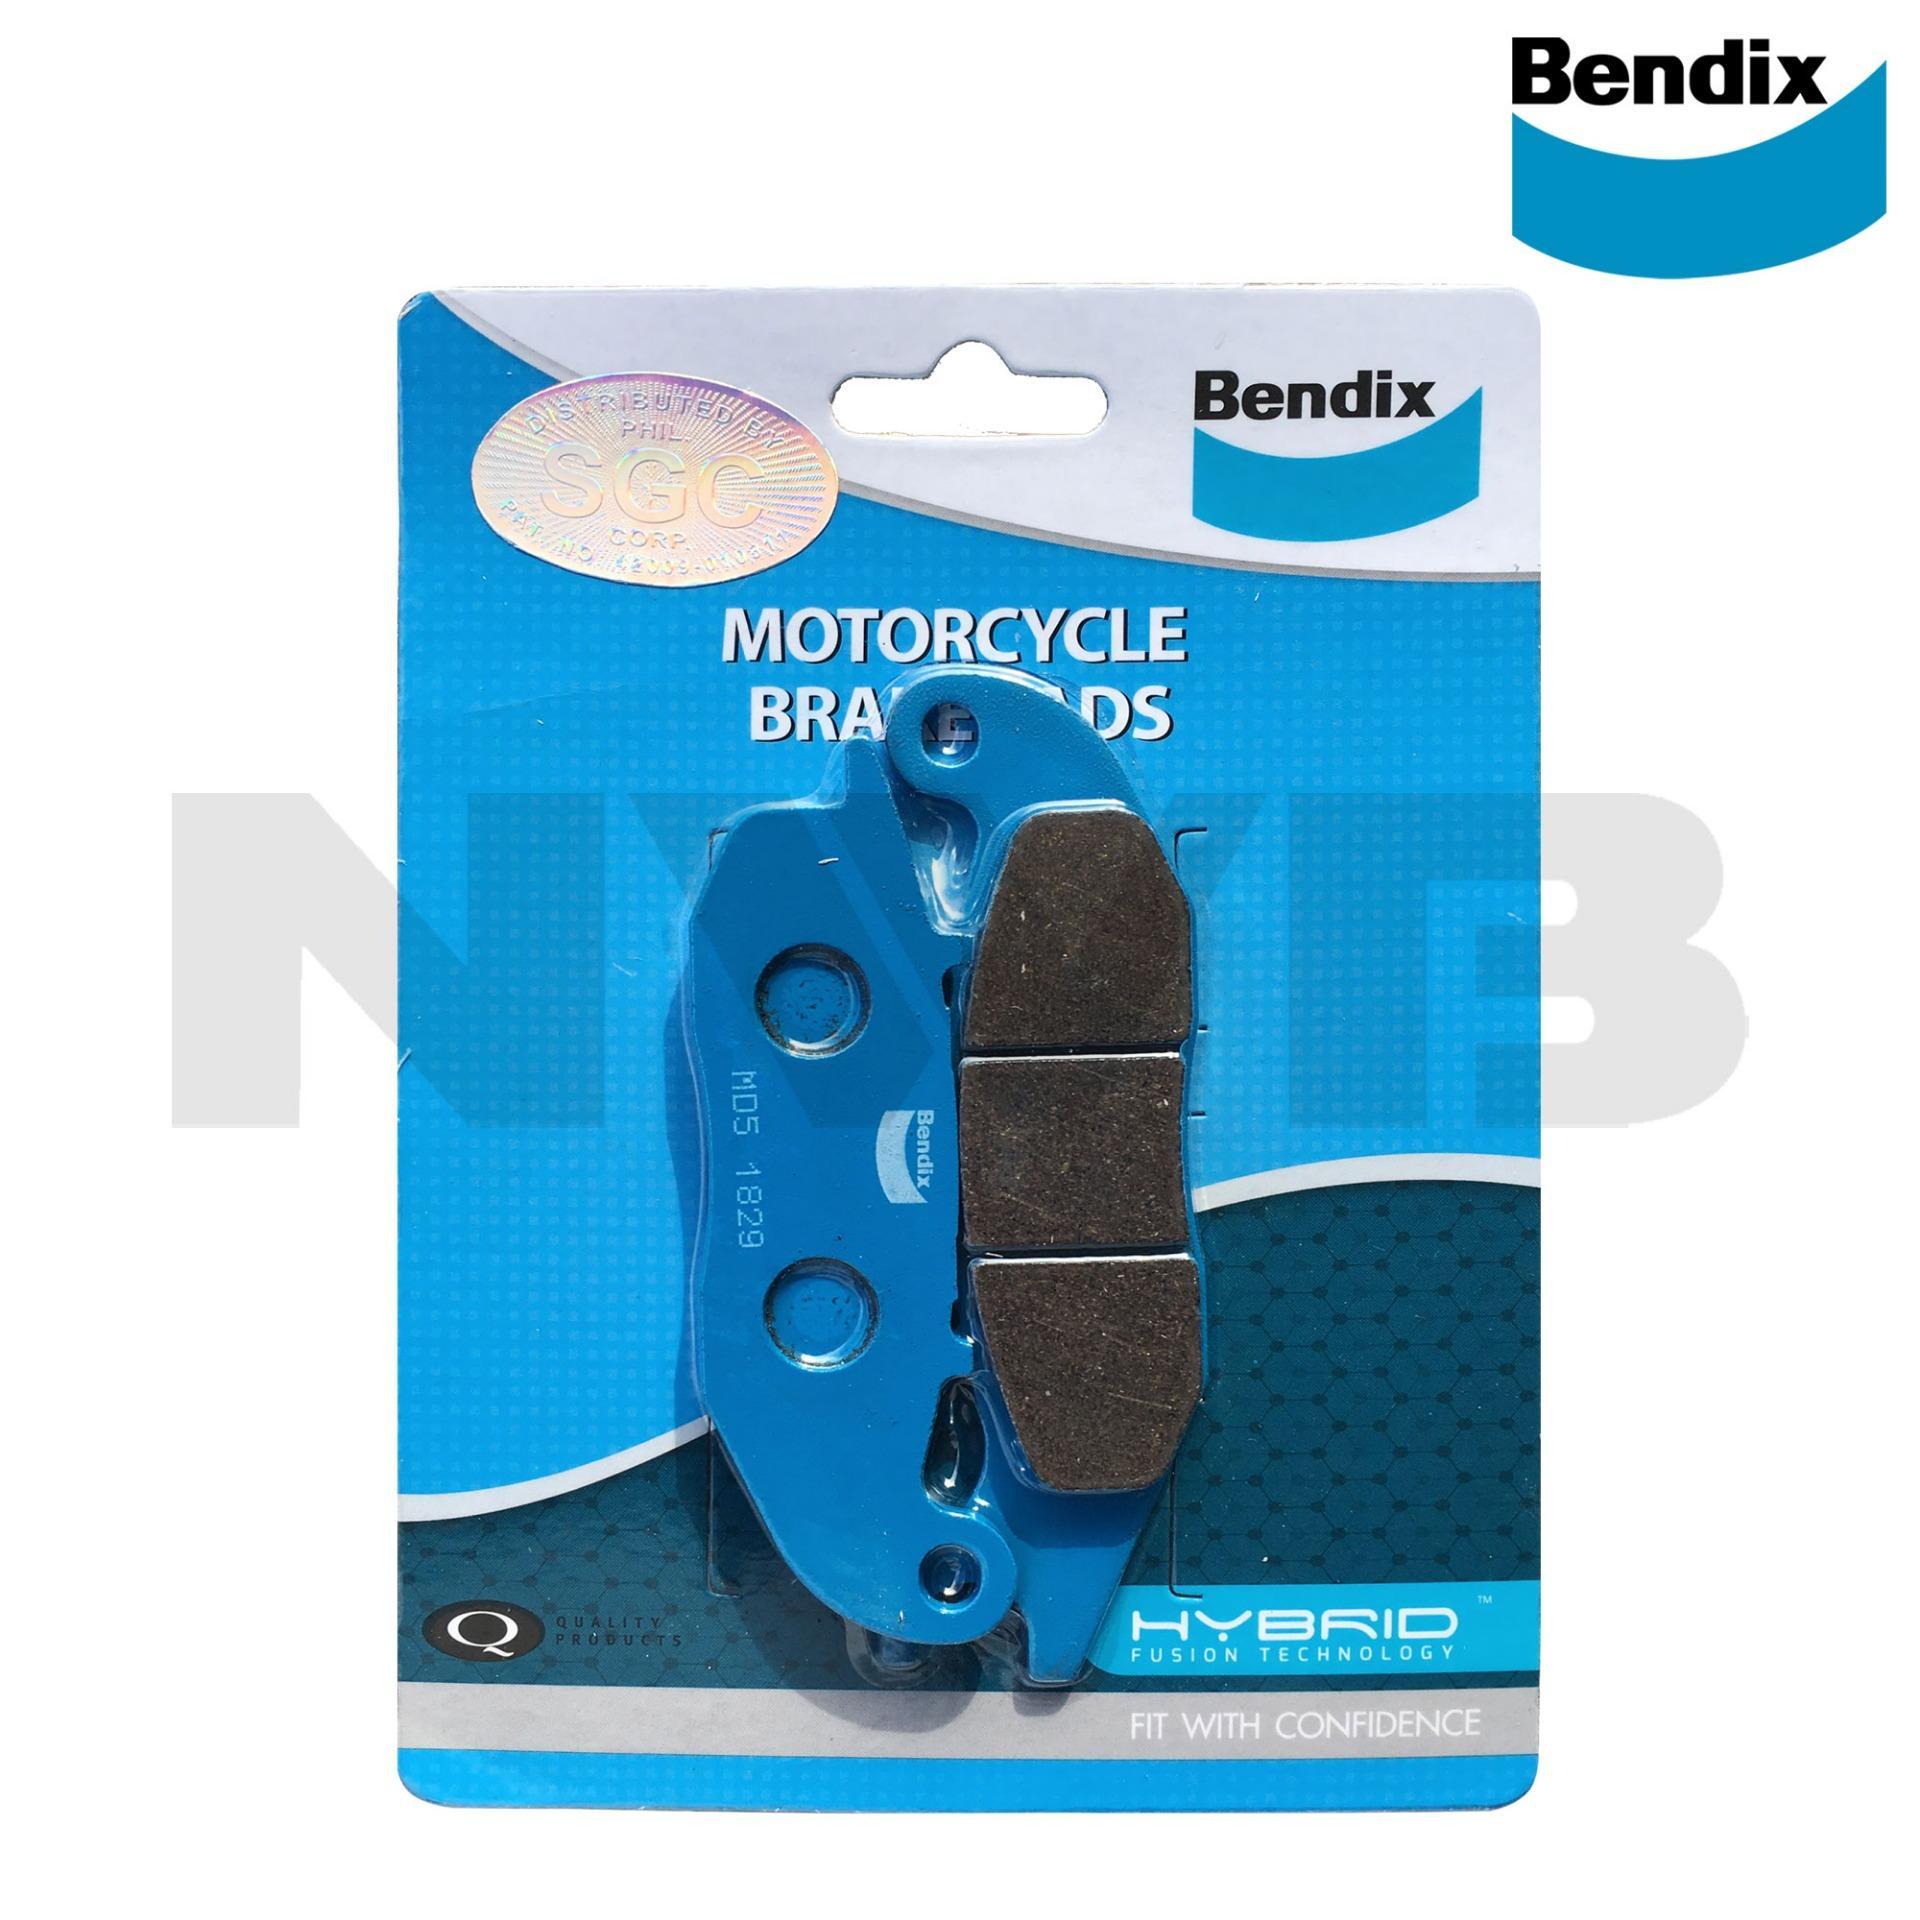 Buy Latest Moto Parts Spares At Best Price Online Lazada Com Ph